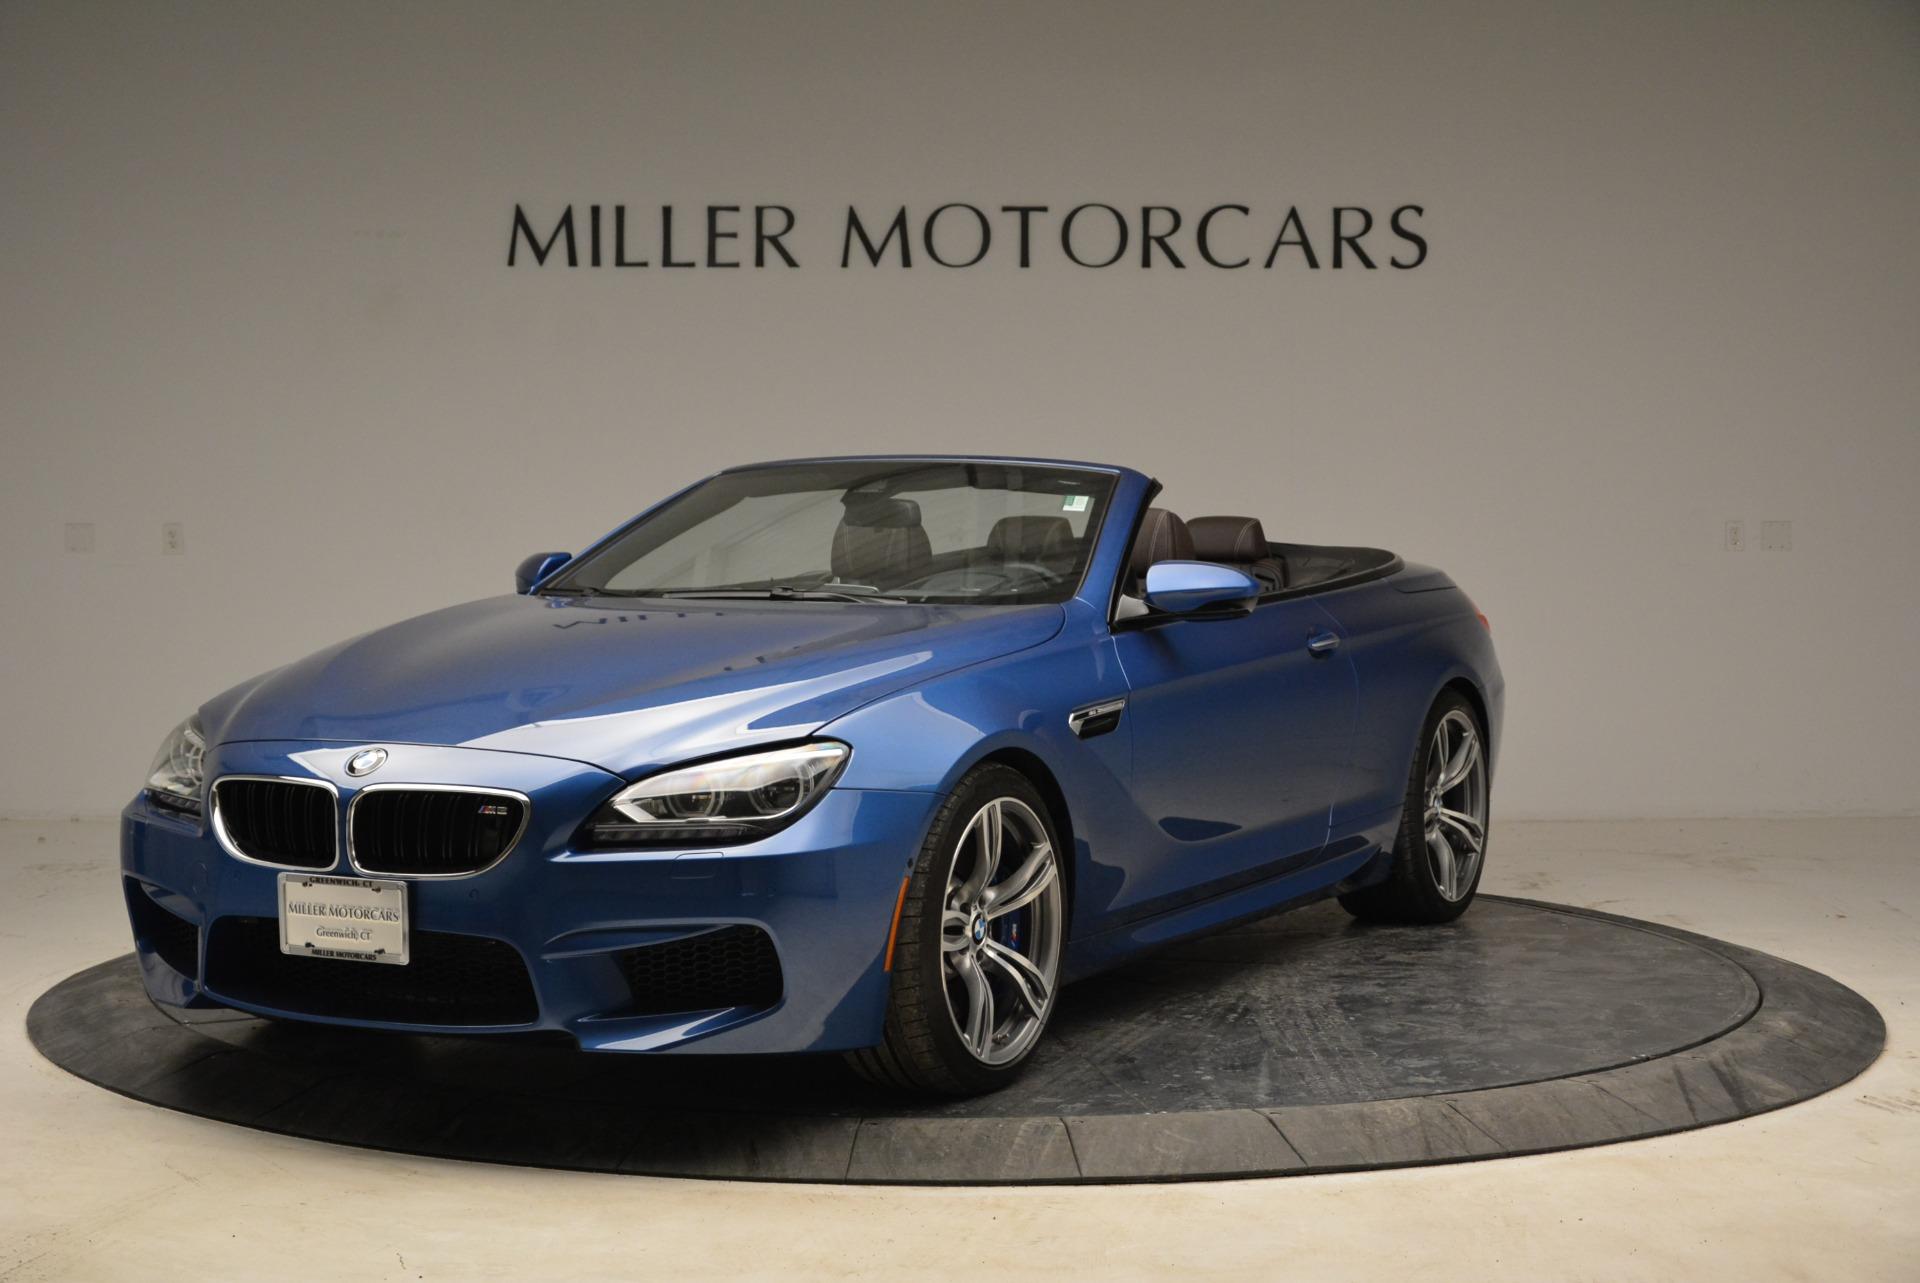 Used 2013 BMW M6 Convertible for sale Sold at Alfa Romeo of Westport in Westport CT 06880 1